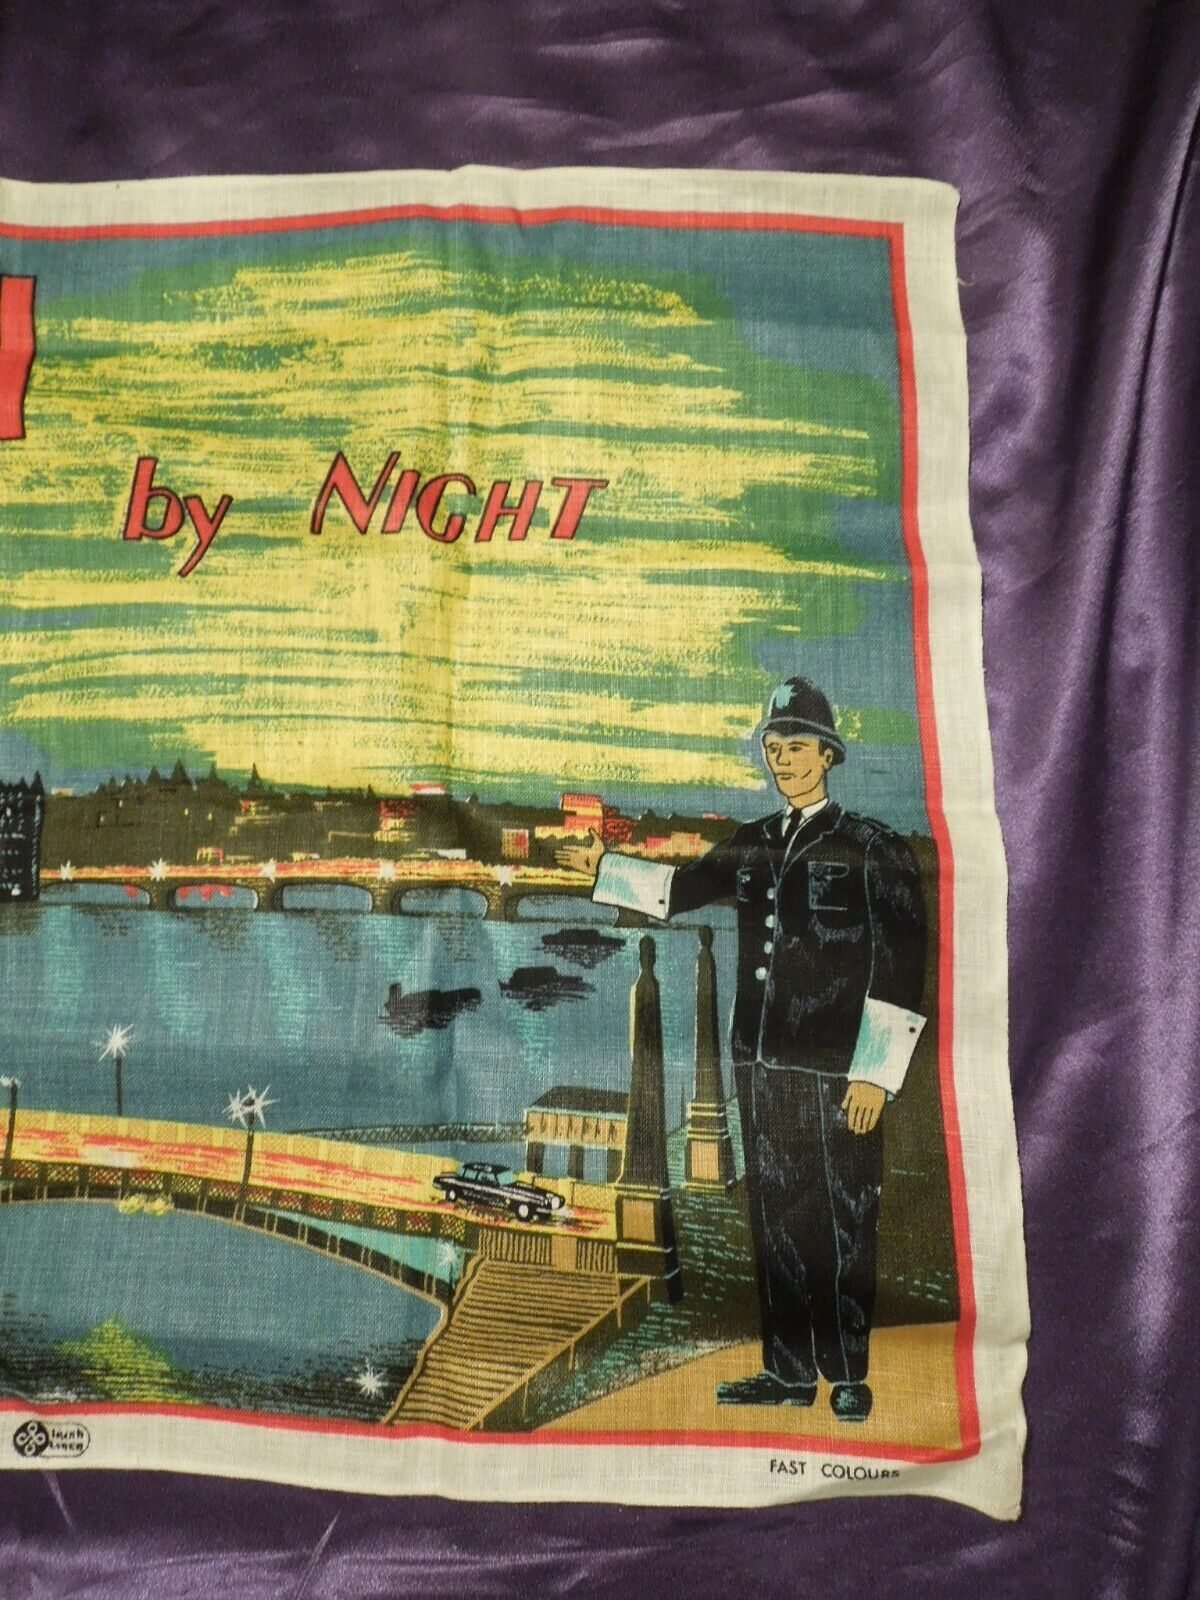 Vintage London by Night by Blackstaff Pure Irish Linen Towel Art image 4